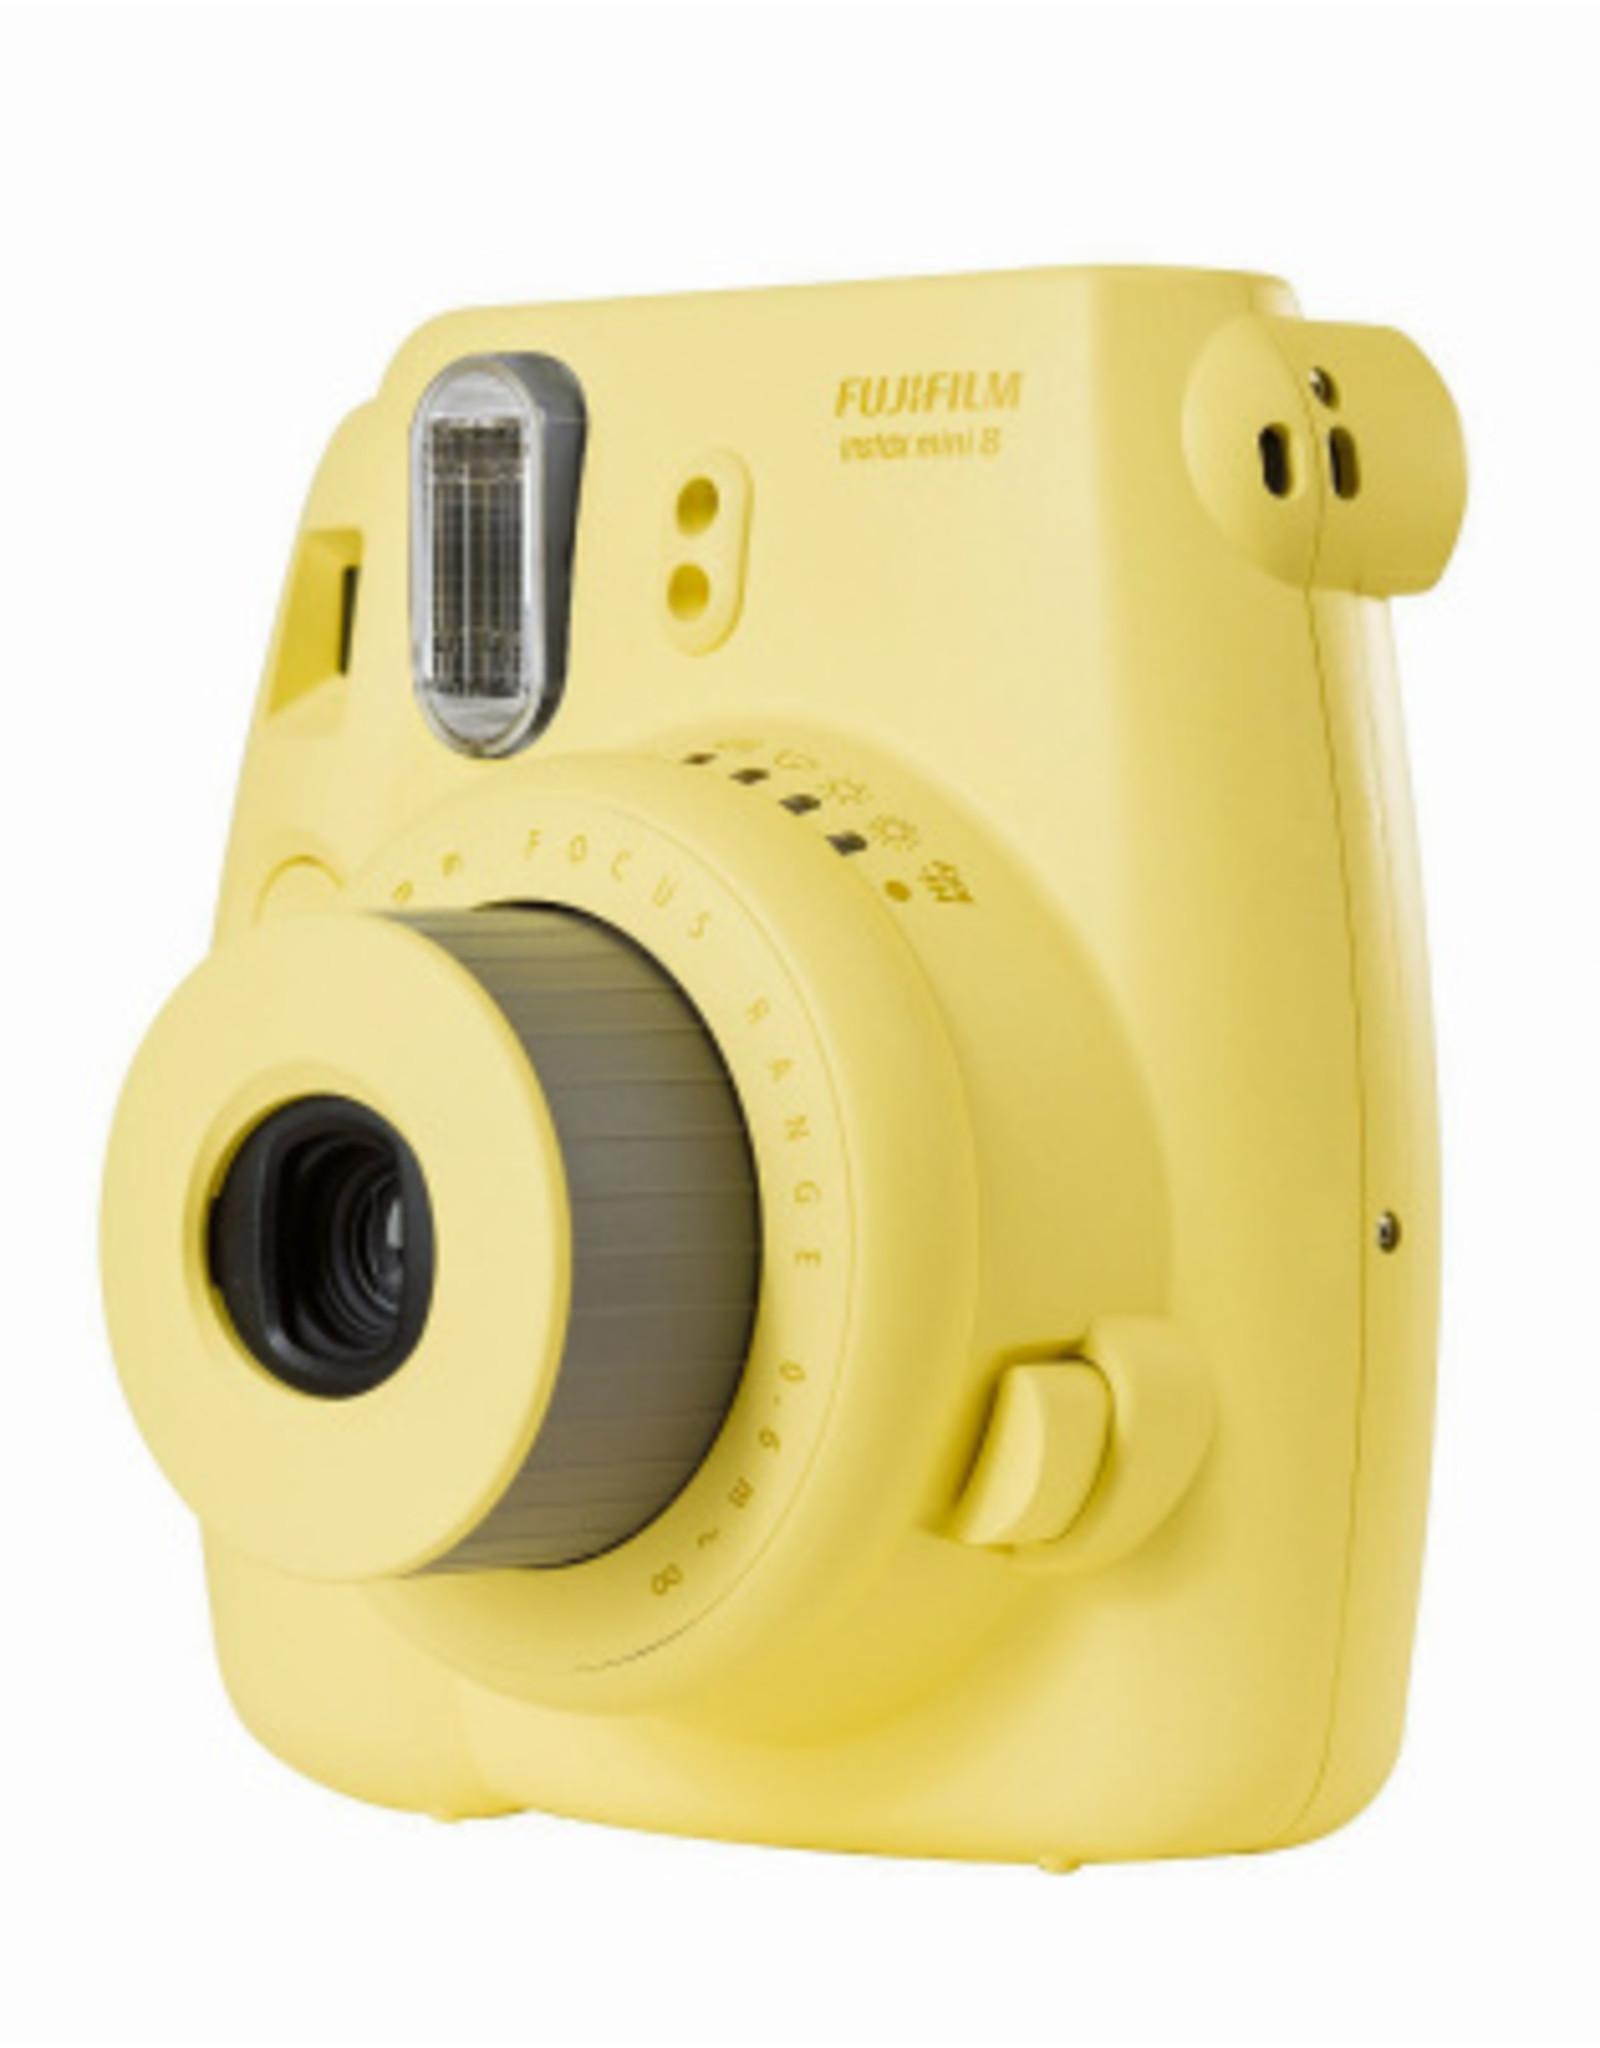 Fuji Fuji Instax Mini 8 Instant Film Camera (Yellow) used